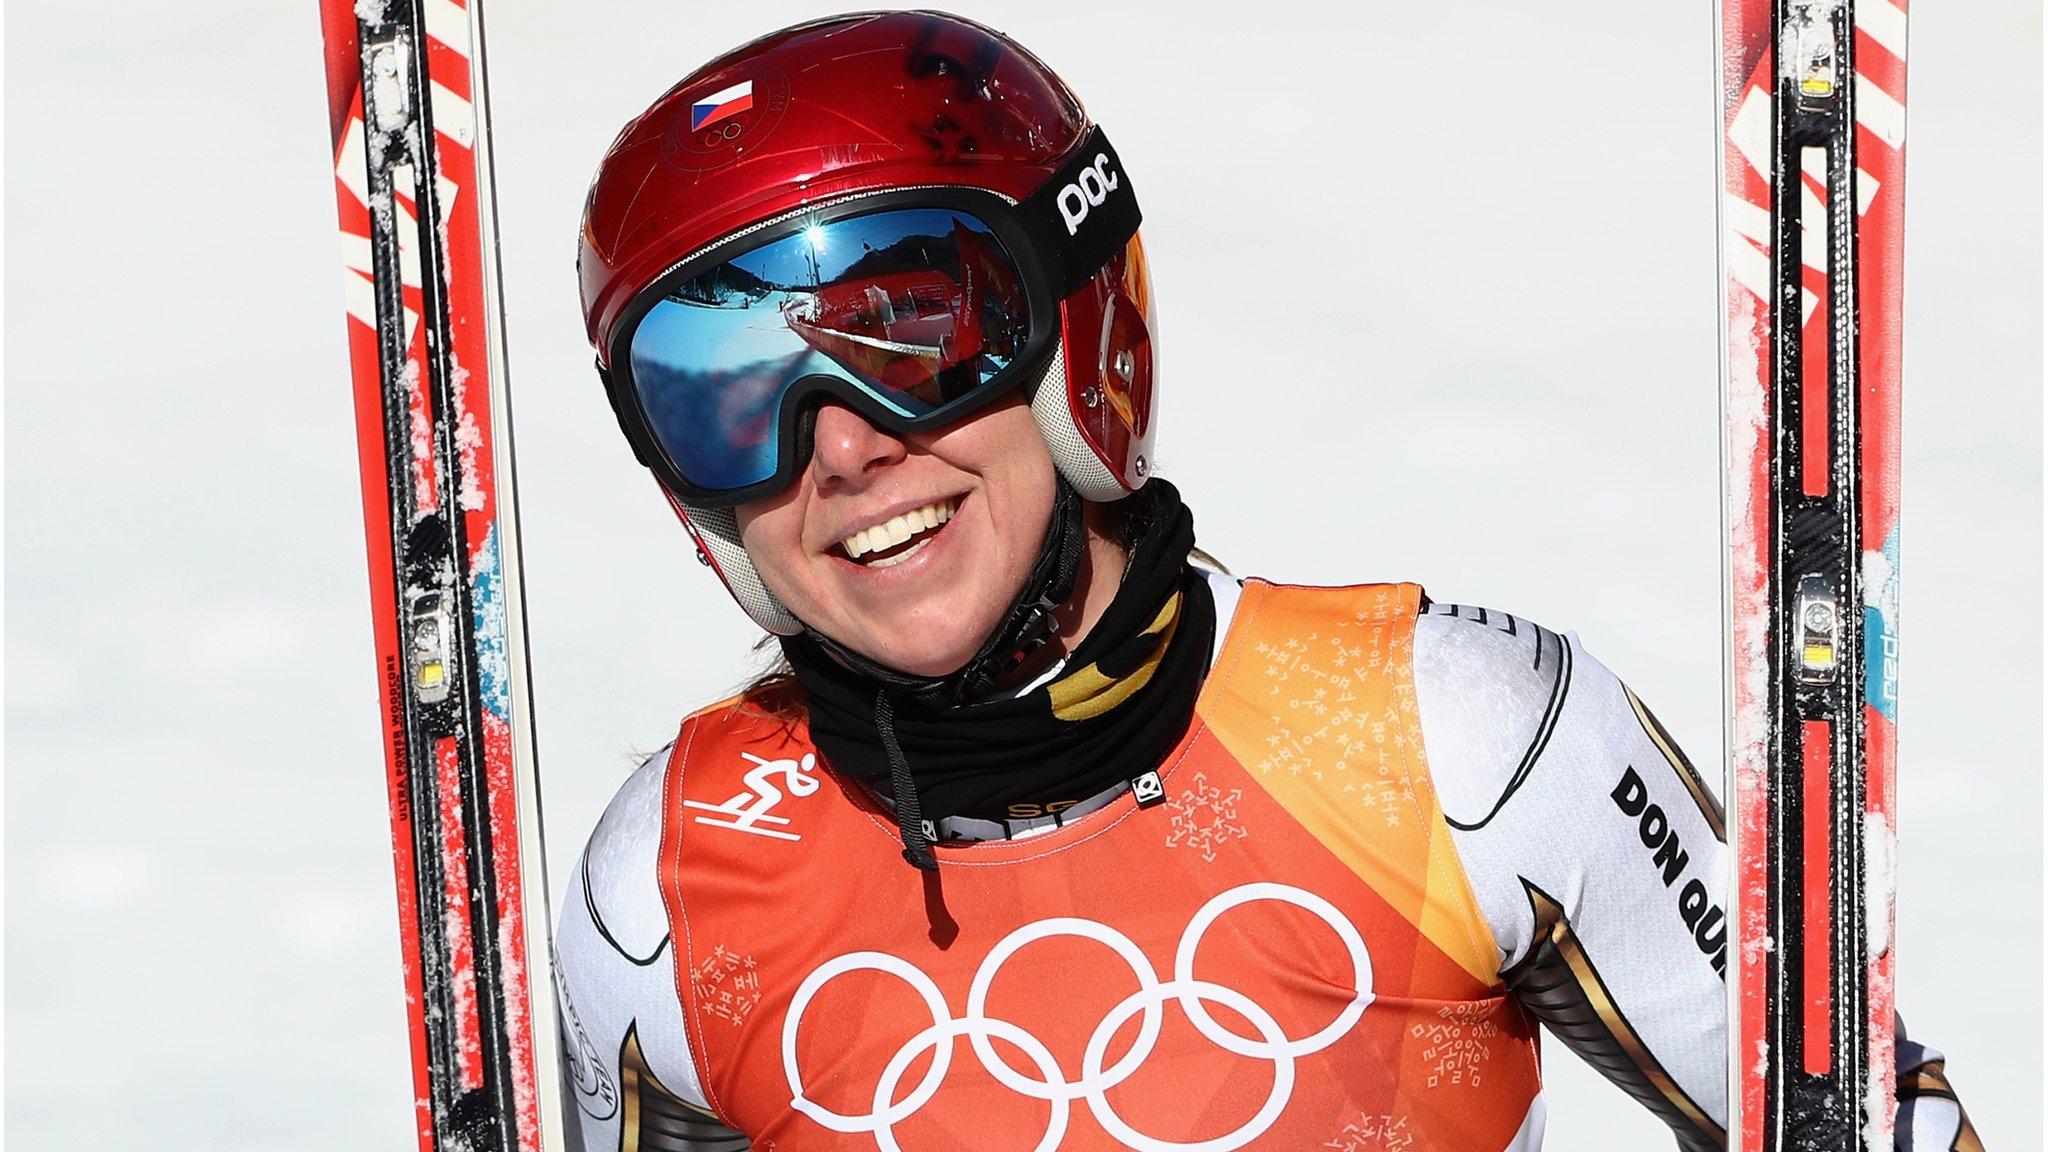 Winter Olympics: Lindsey Vonn misses medals in super G as Ester Ledecka earns shock win